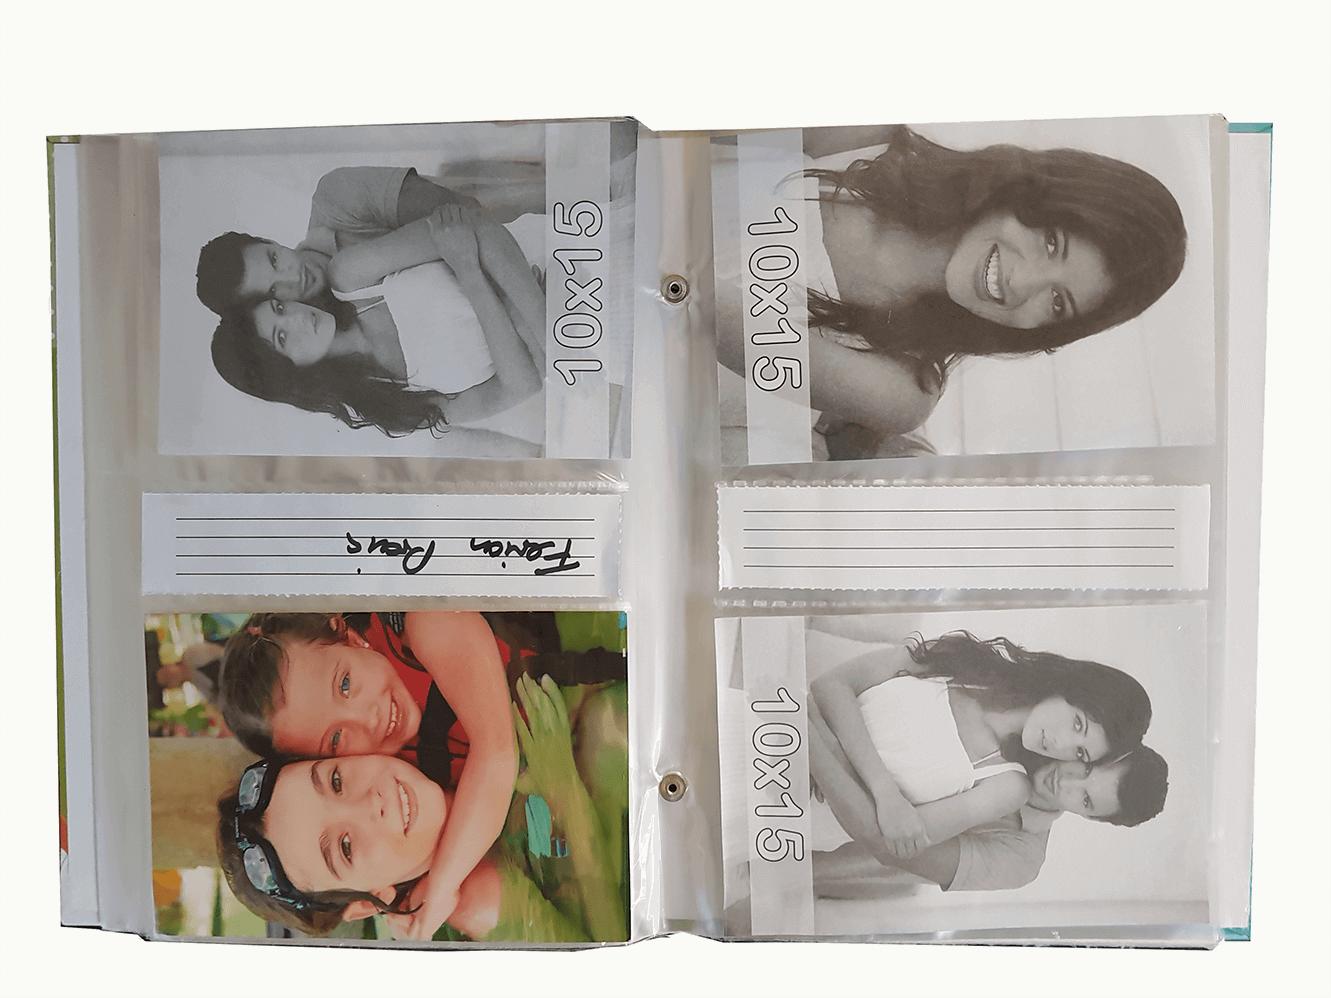 4 albuns de foto 10x15/208 fotos c/rebite